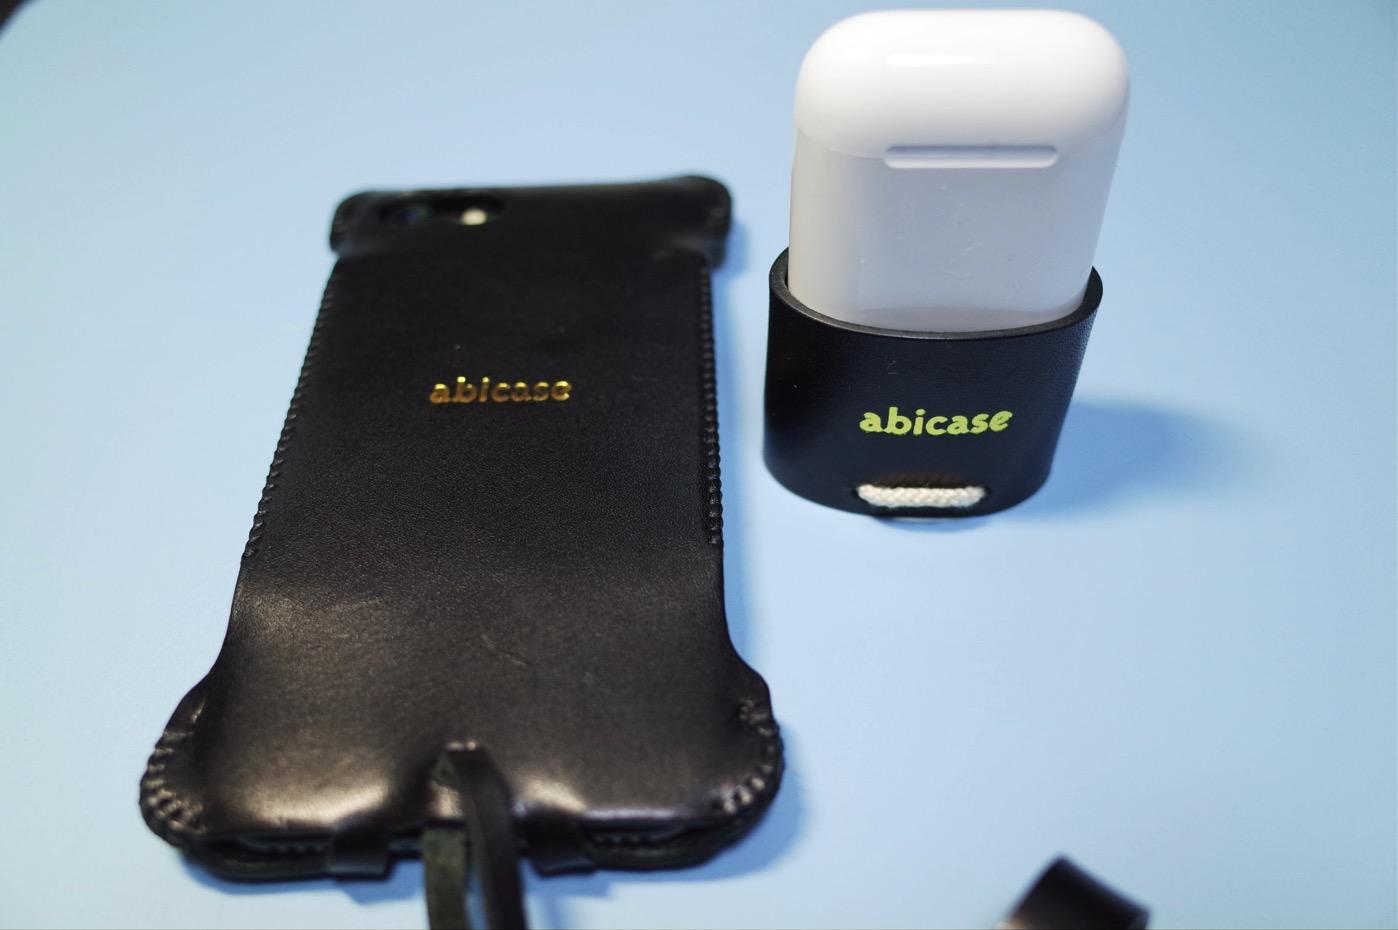 iPhone 7 ジェットブラック & abicase-1